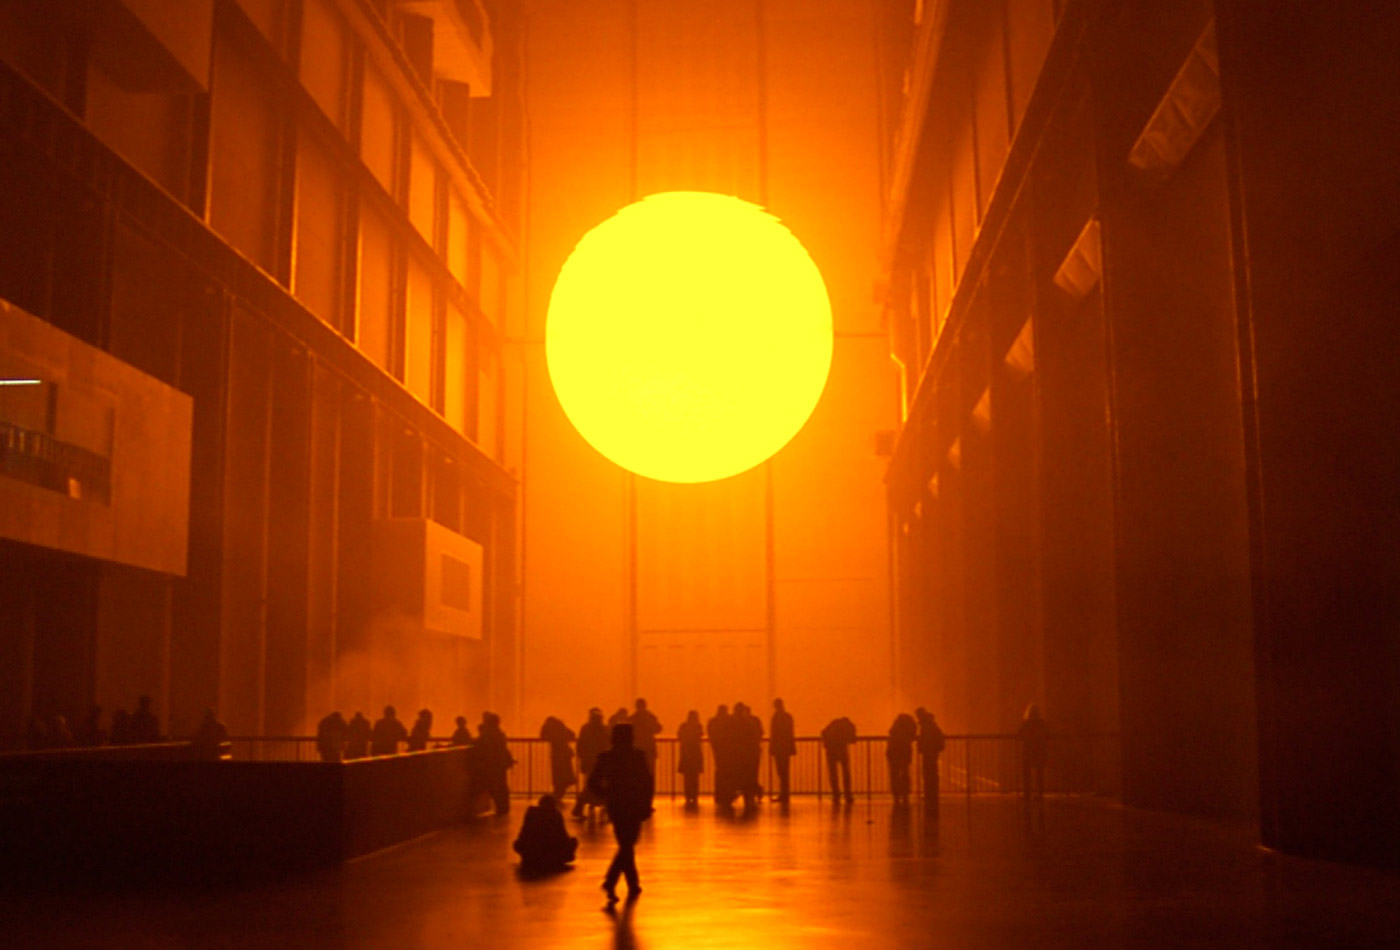 A sun simulacrum by Olafur Eliasson.